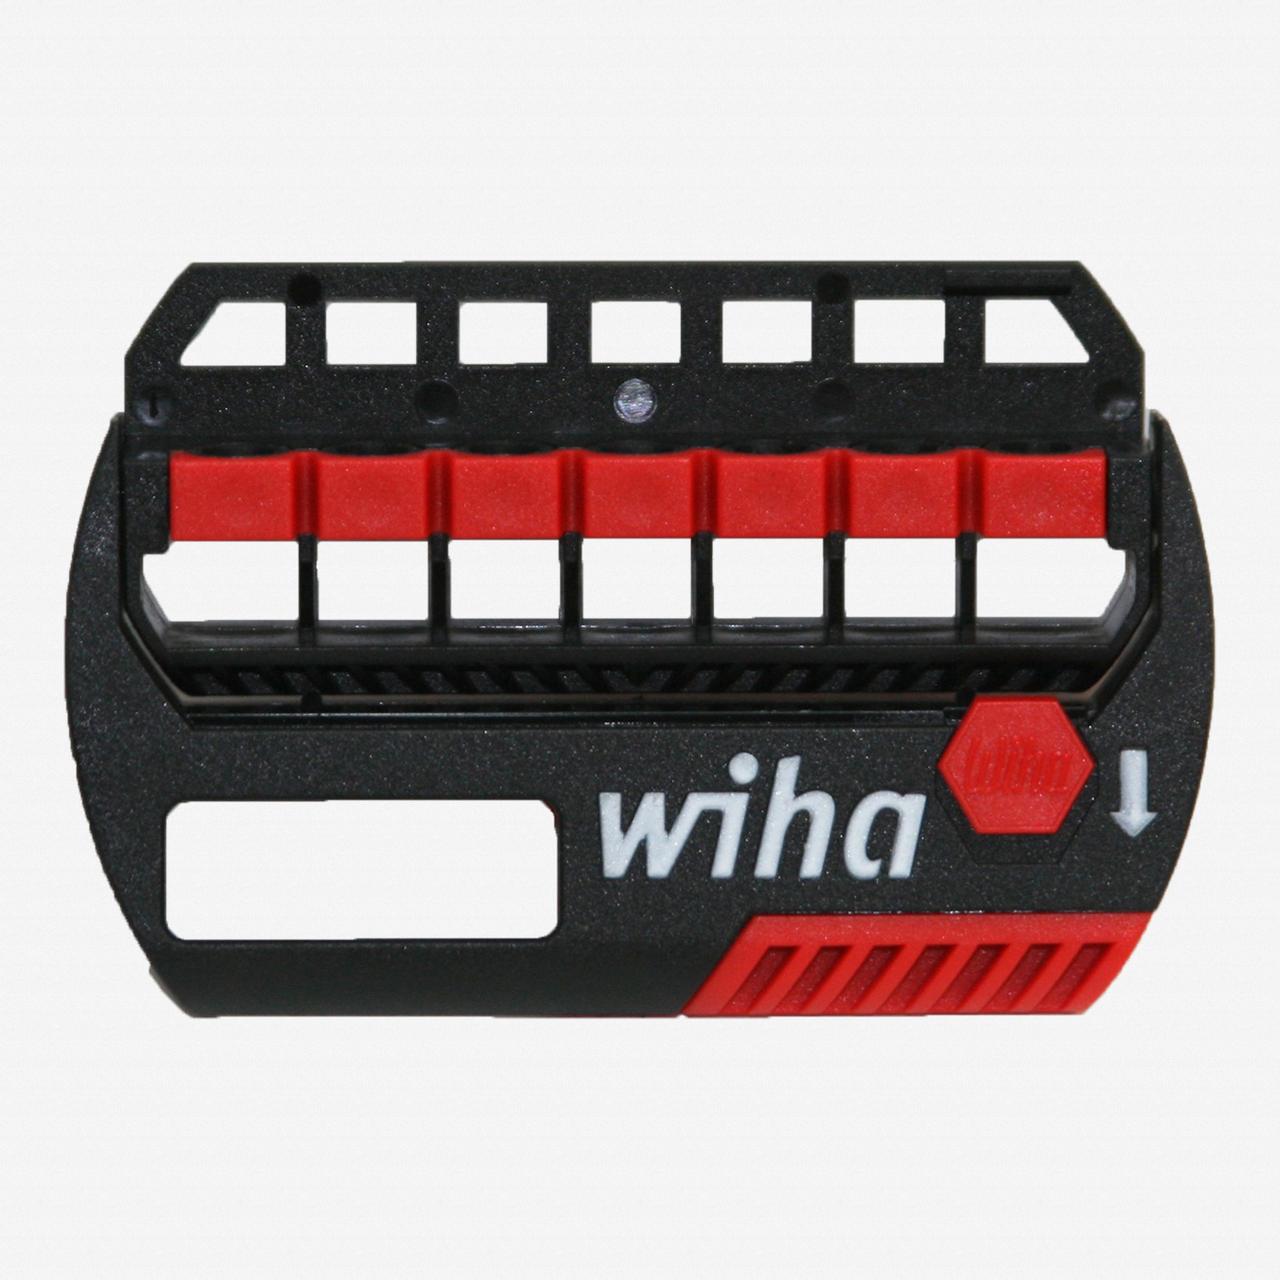 Wiha 91247 Empty Terminator Insert Bit Buddy Case - KC Tool